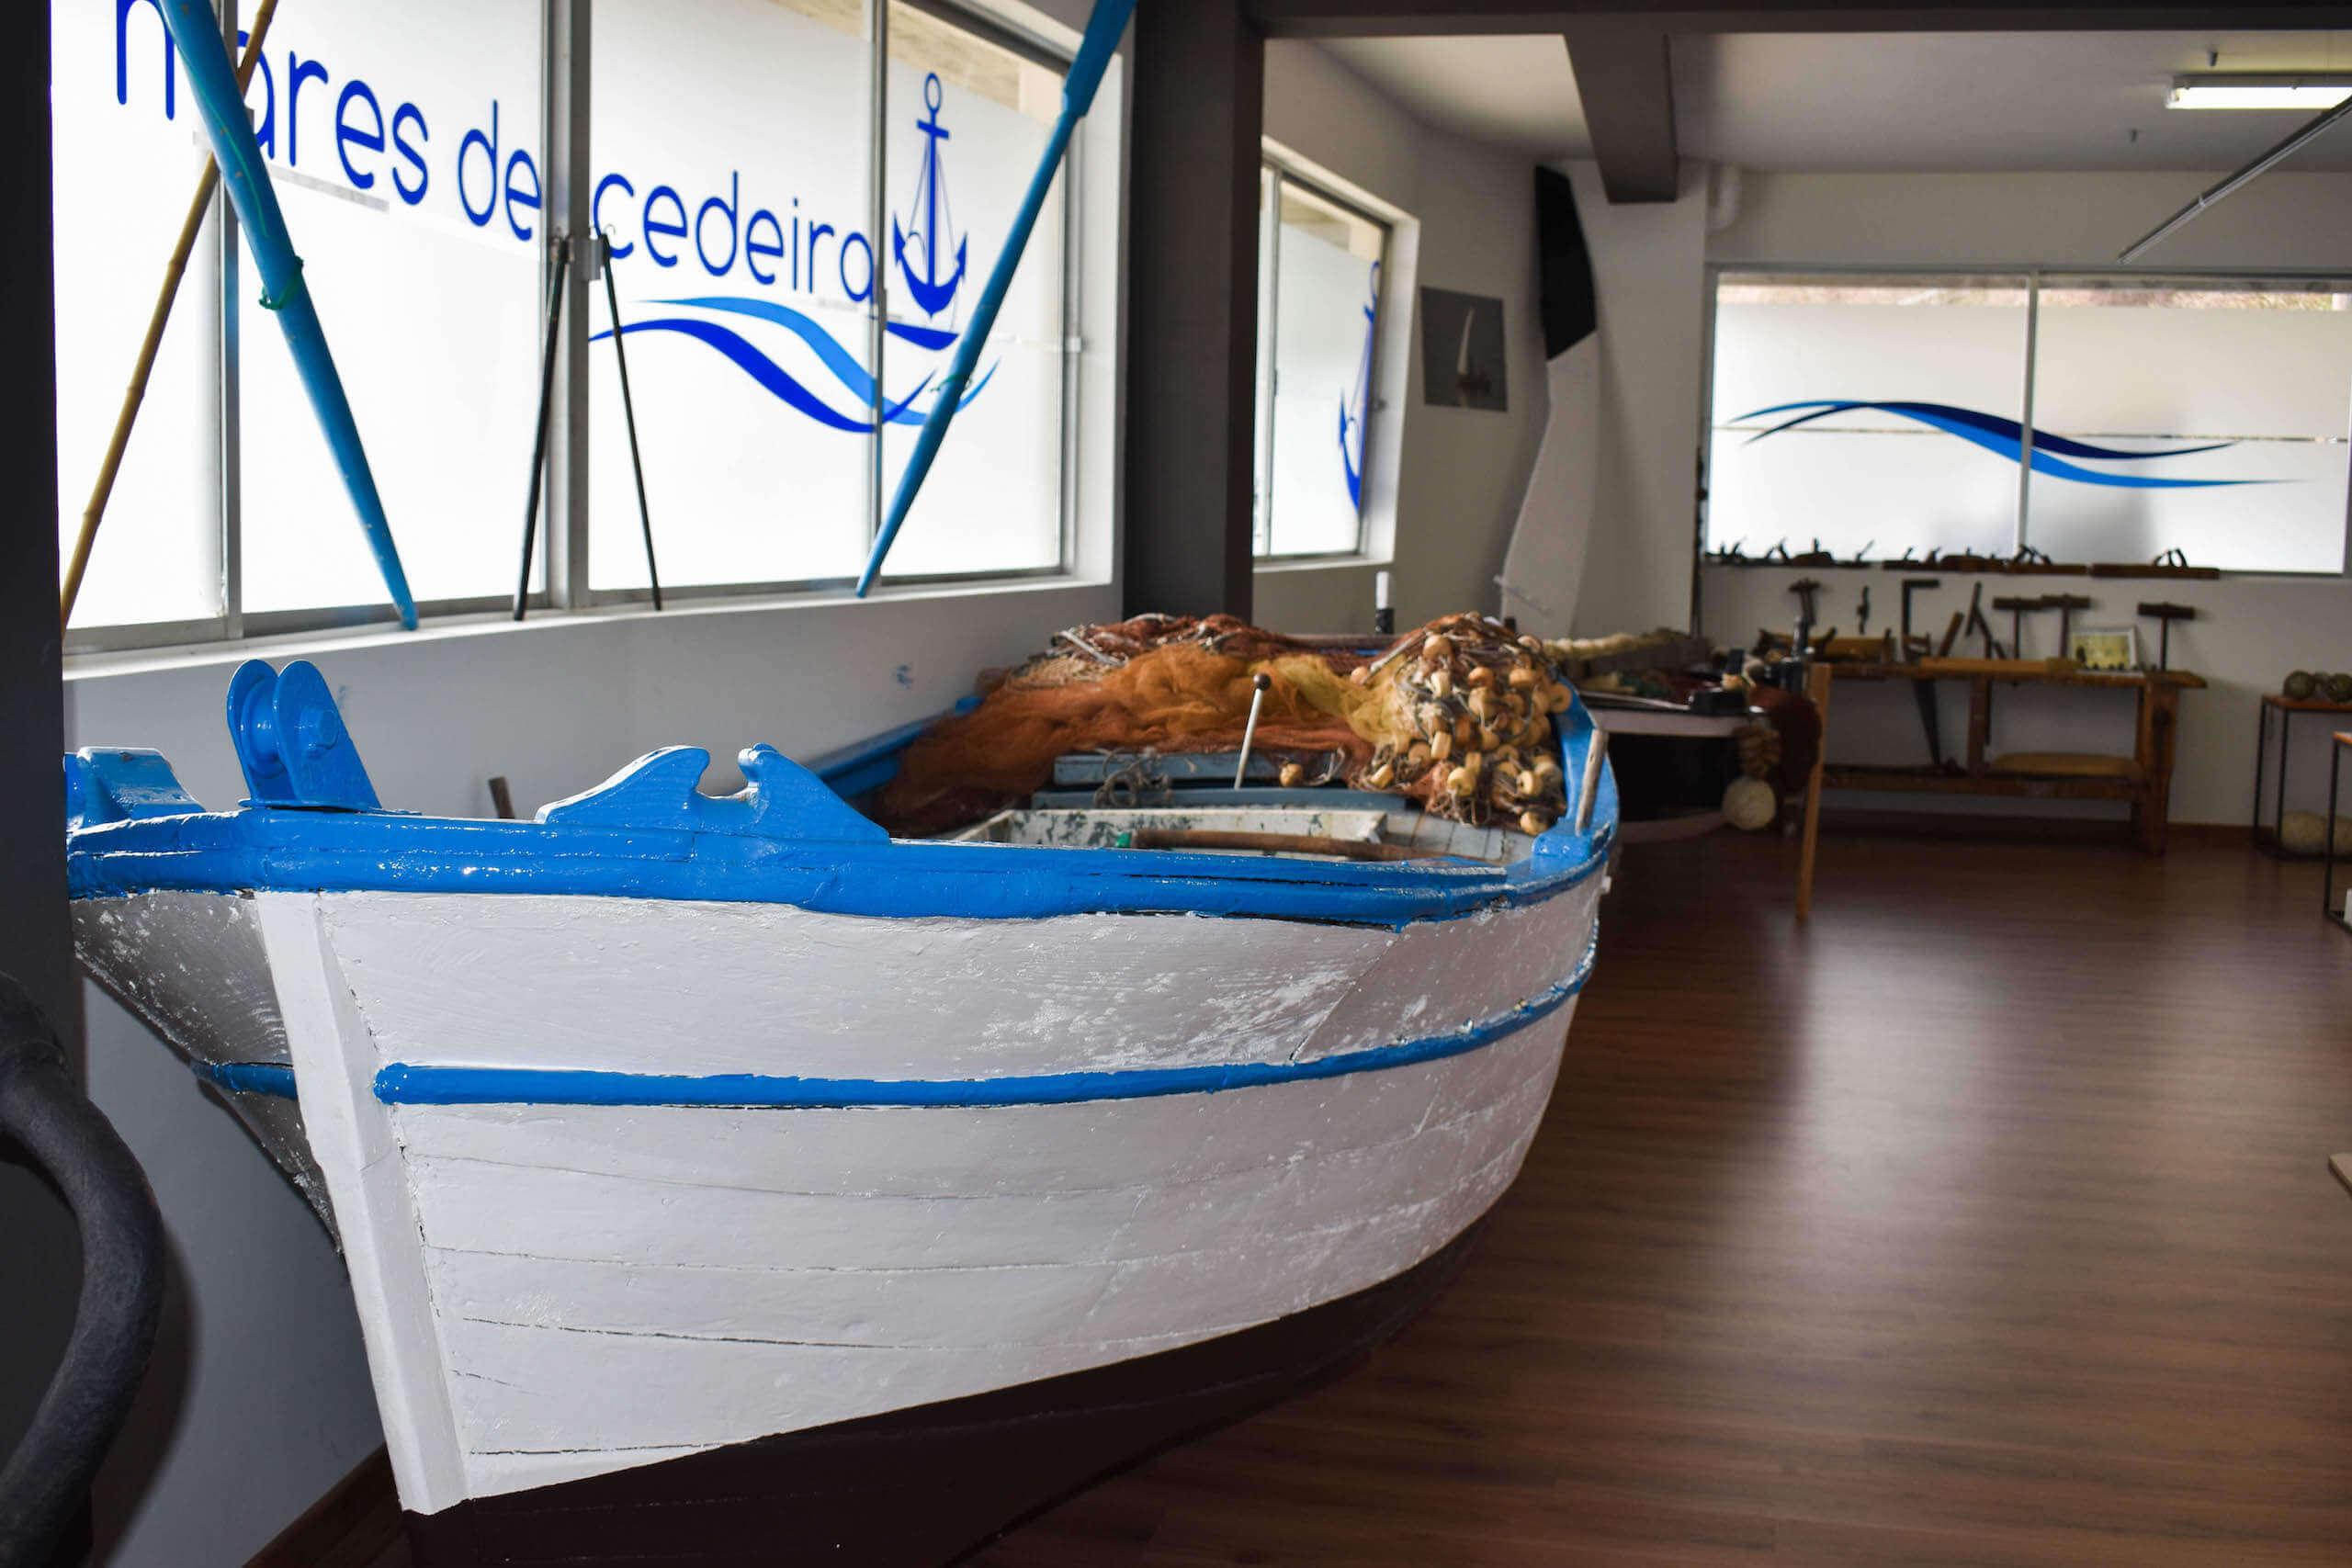 Embarcacion tradicional cedeiresa dentro del museo - Museo Mares de Cedeira